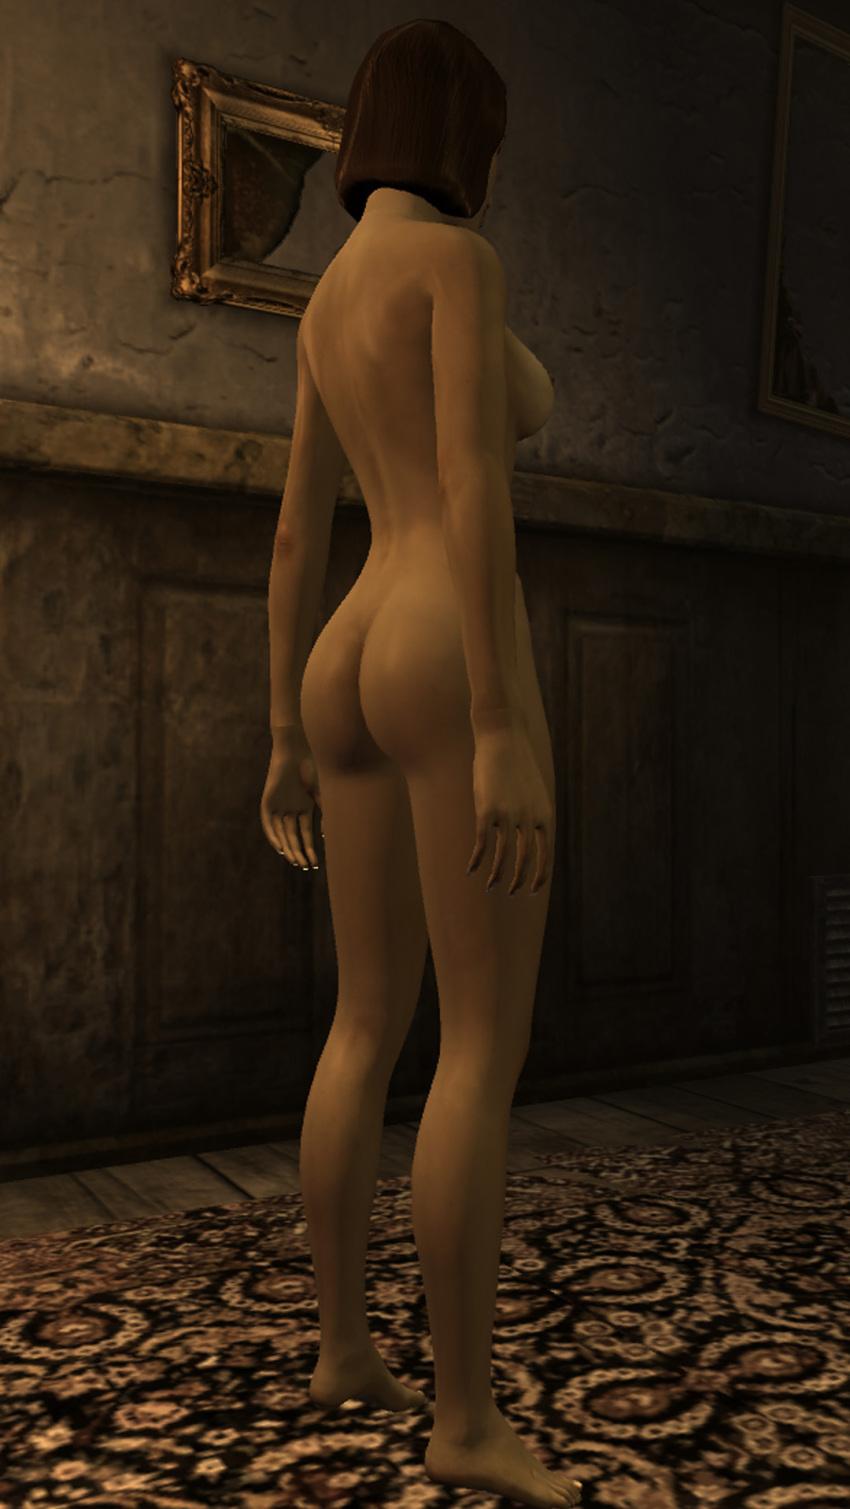 fortune vegas new fallout miss The witcher 3 anna henrietta